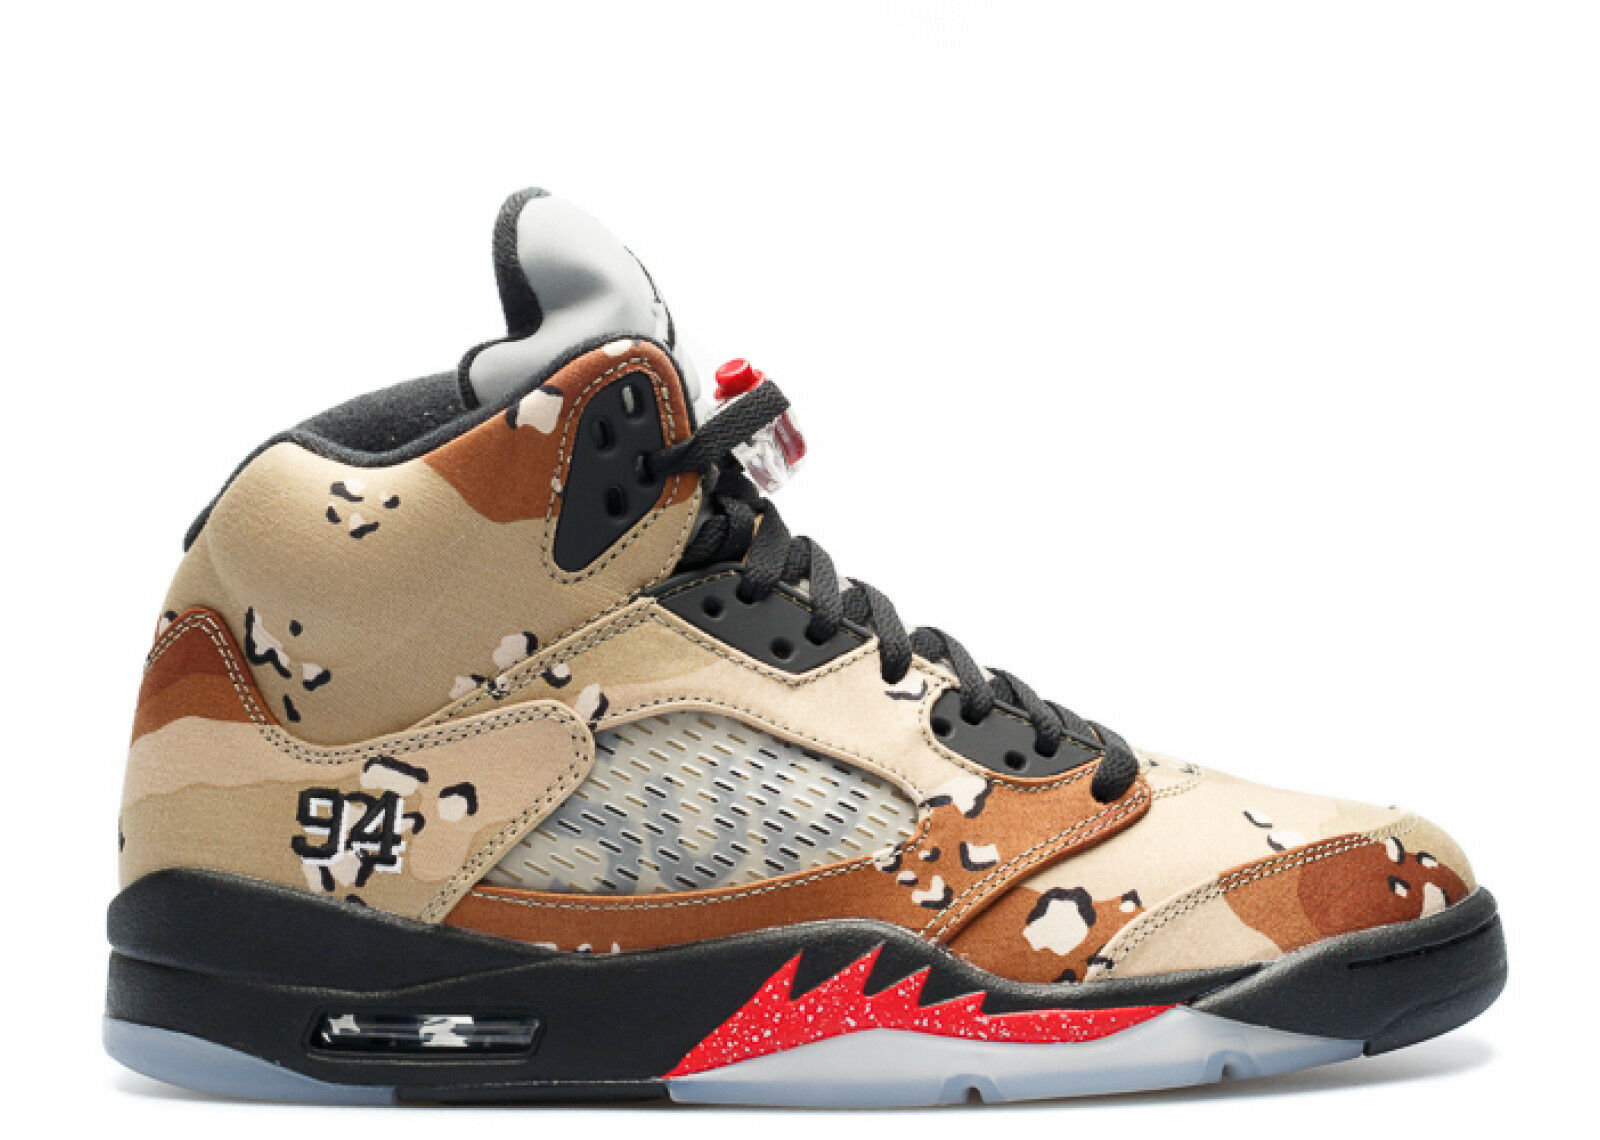 Supreme X Nike Air Jordan 5 V Retro Desert Camo Size 12. 824371-201